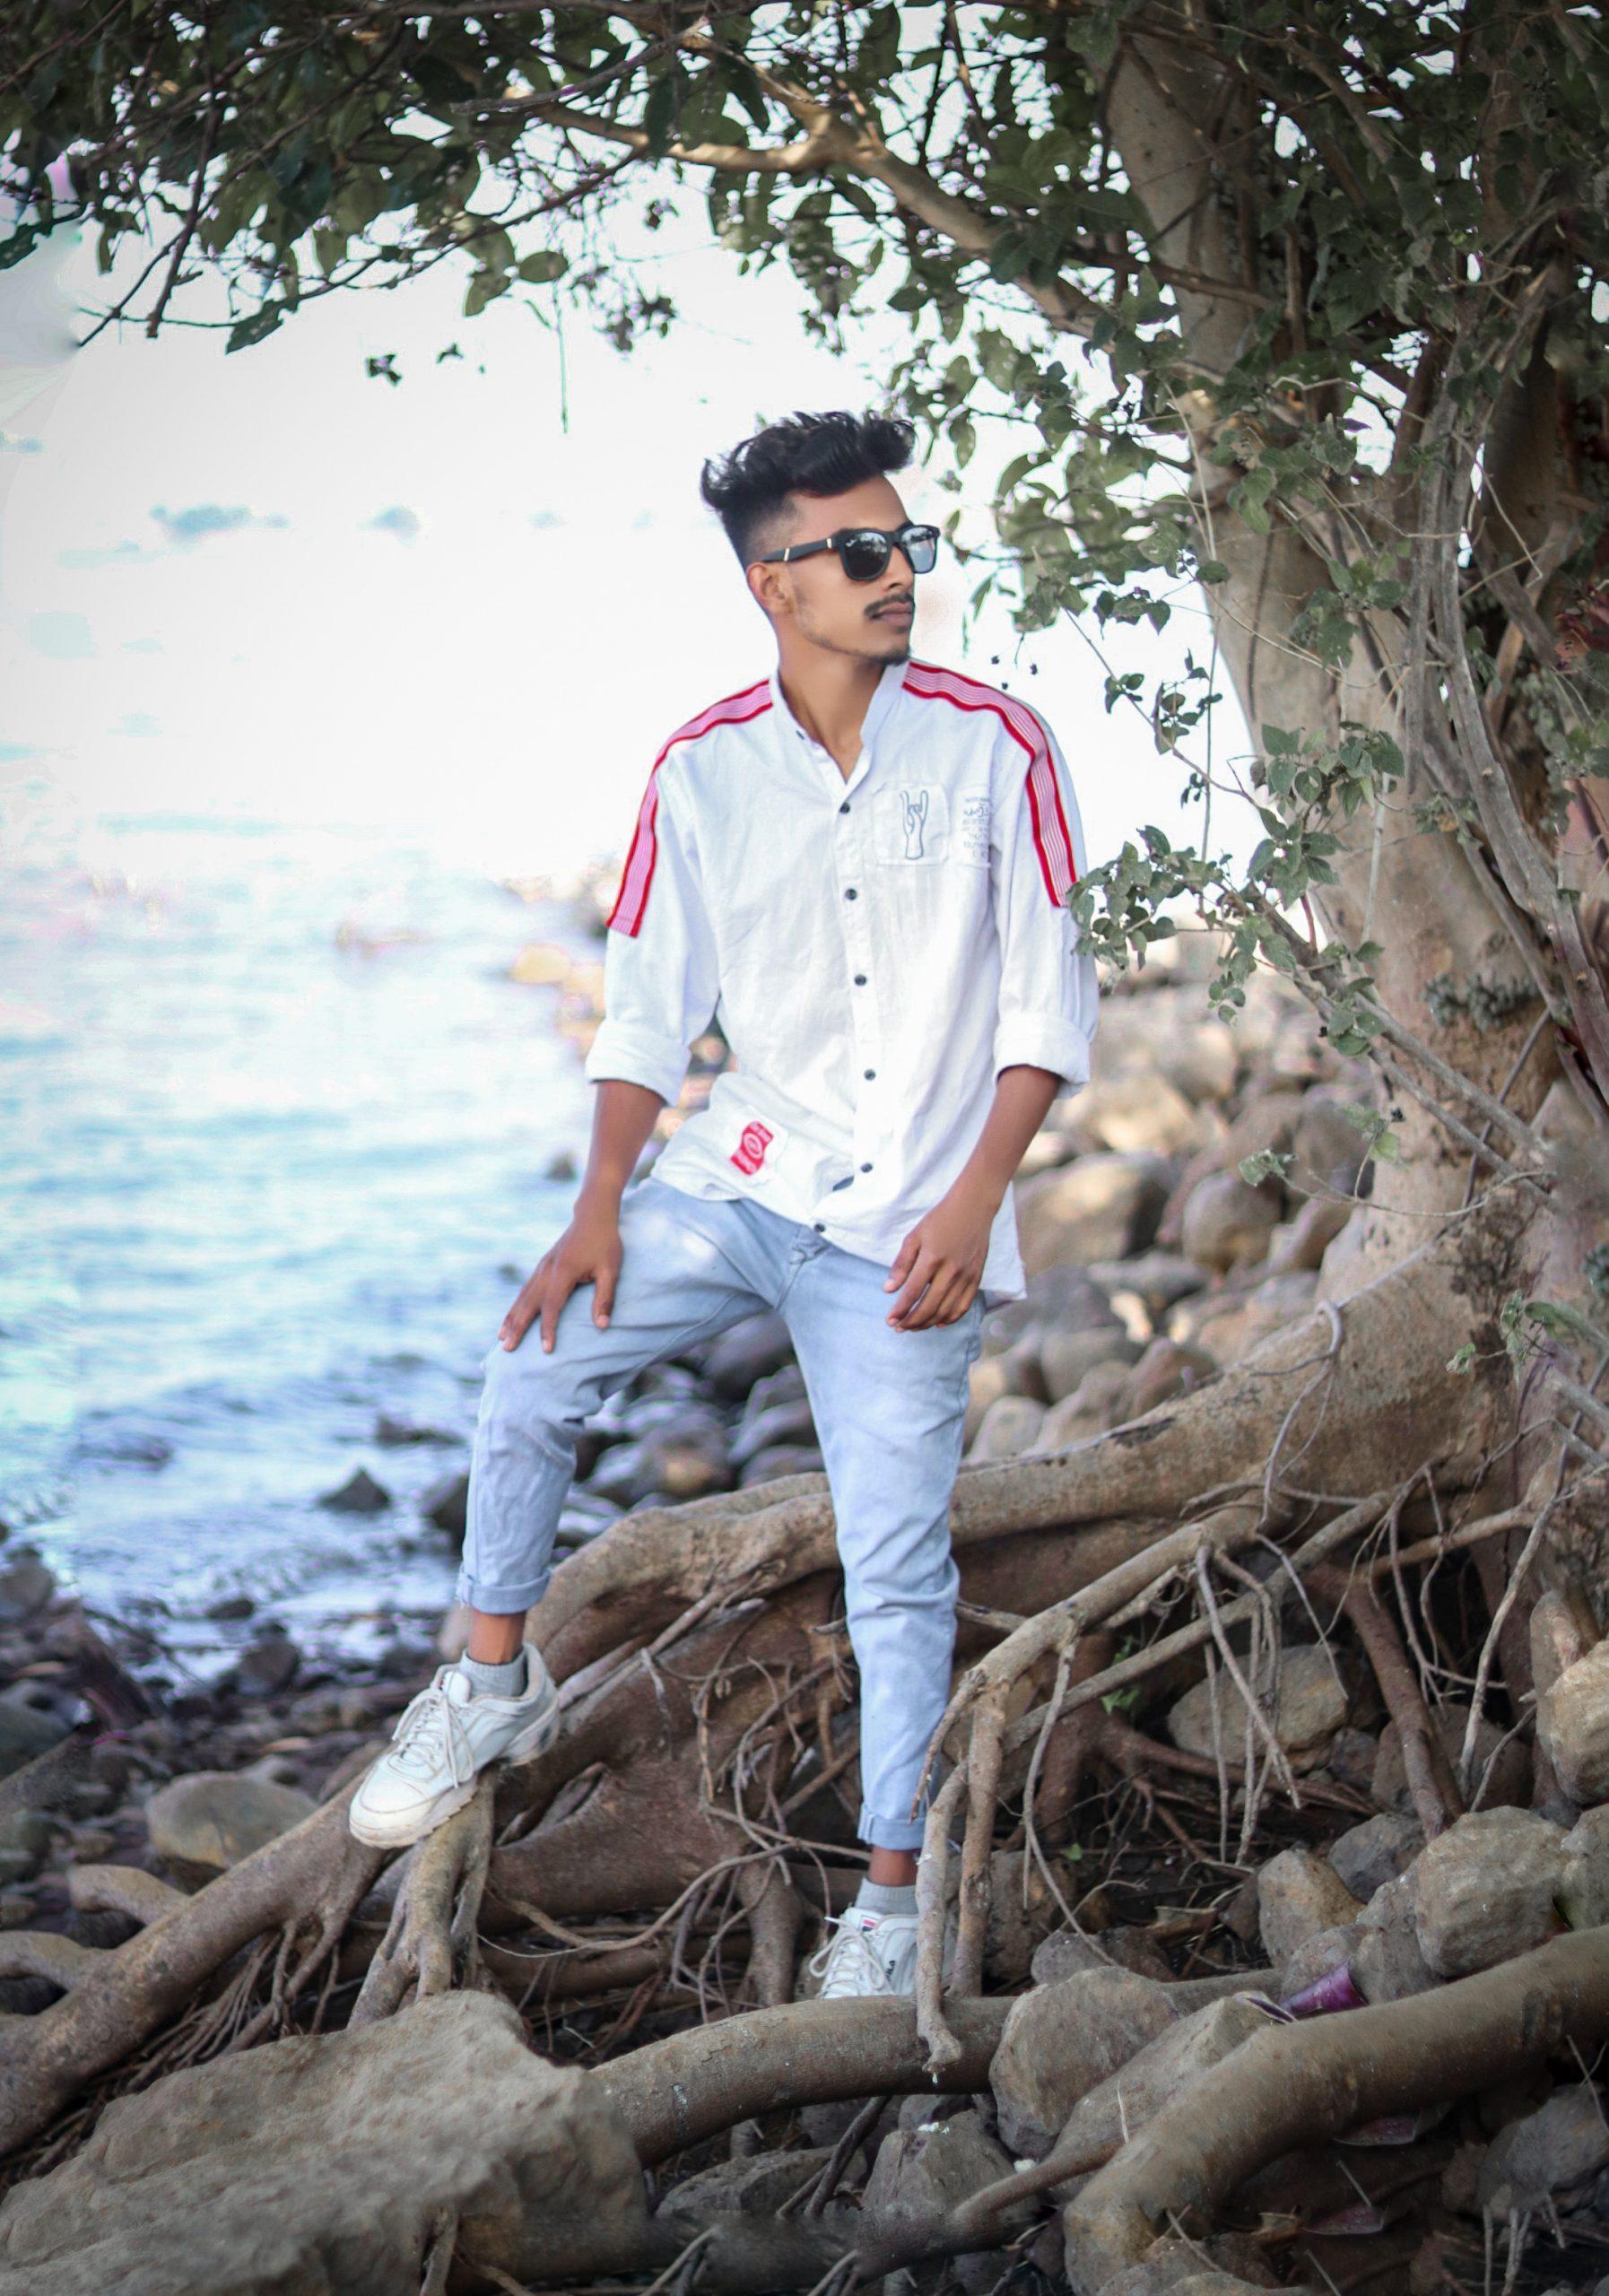 A stylish boy on a tree roots